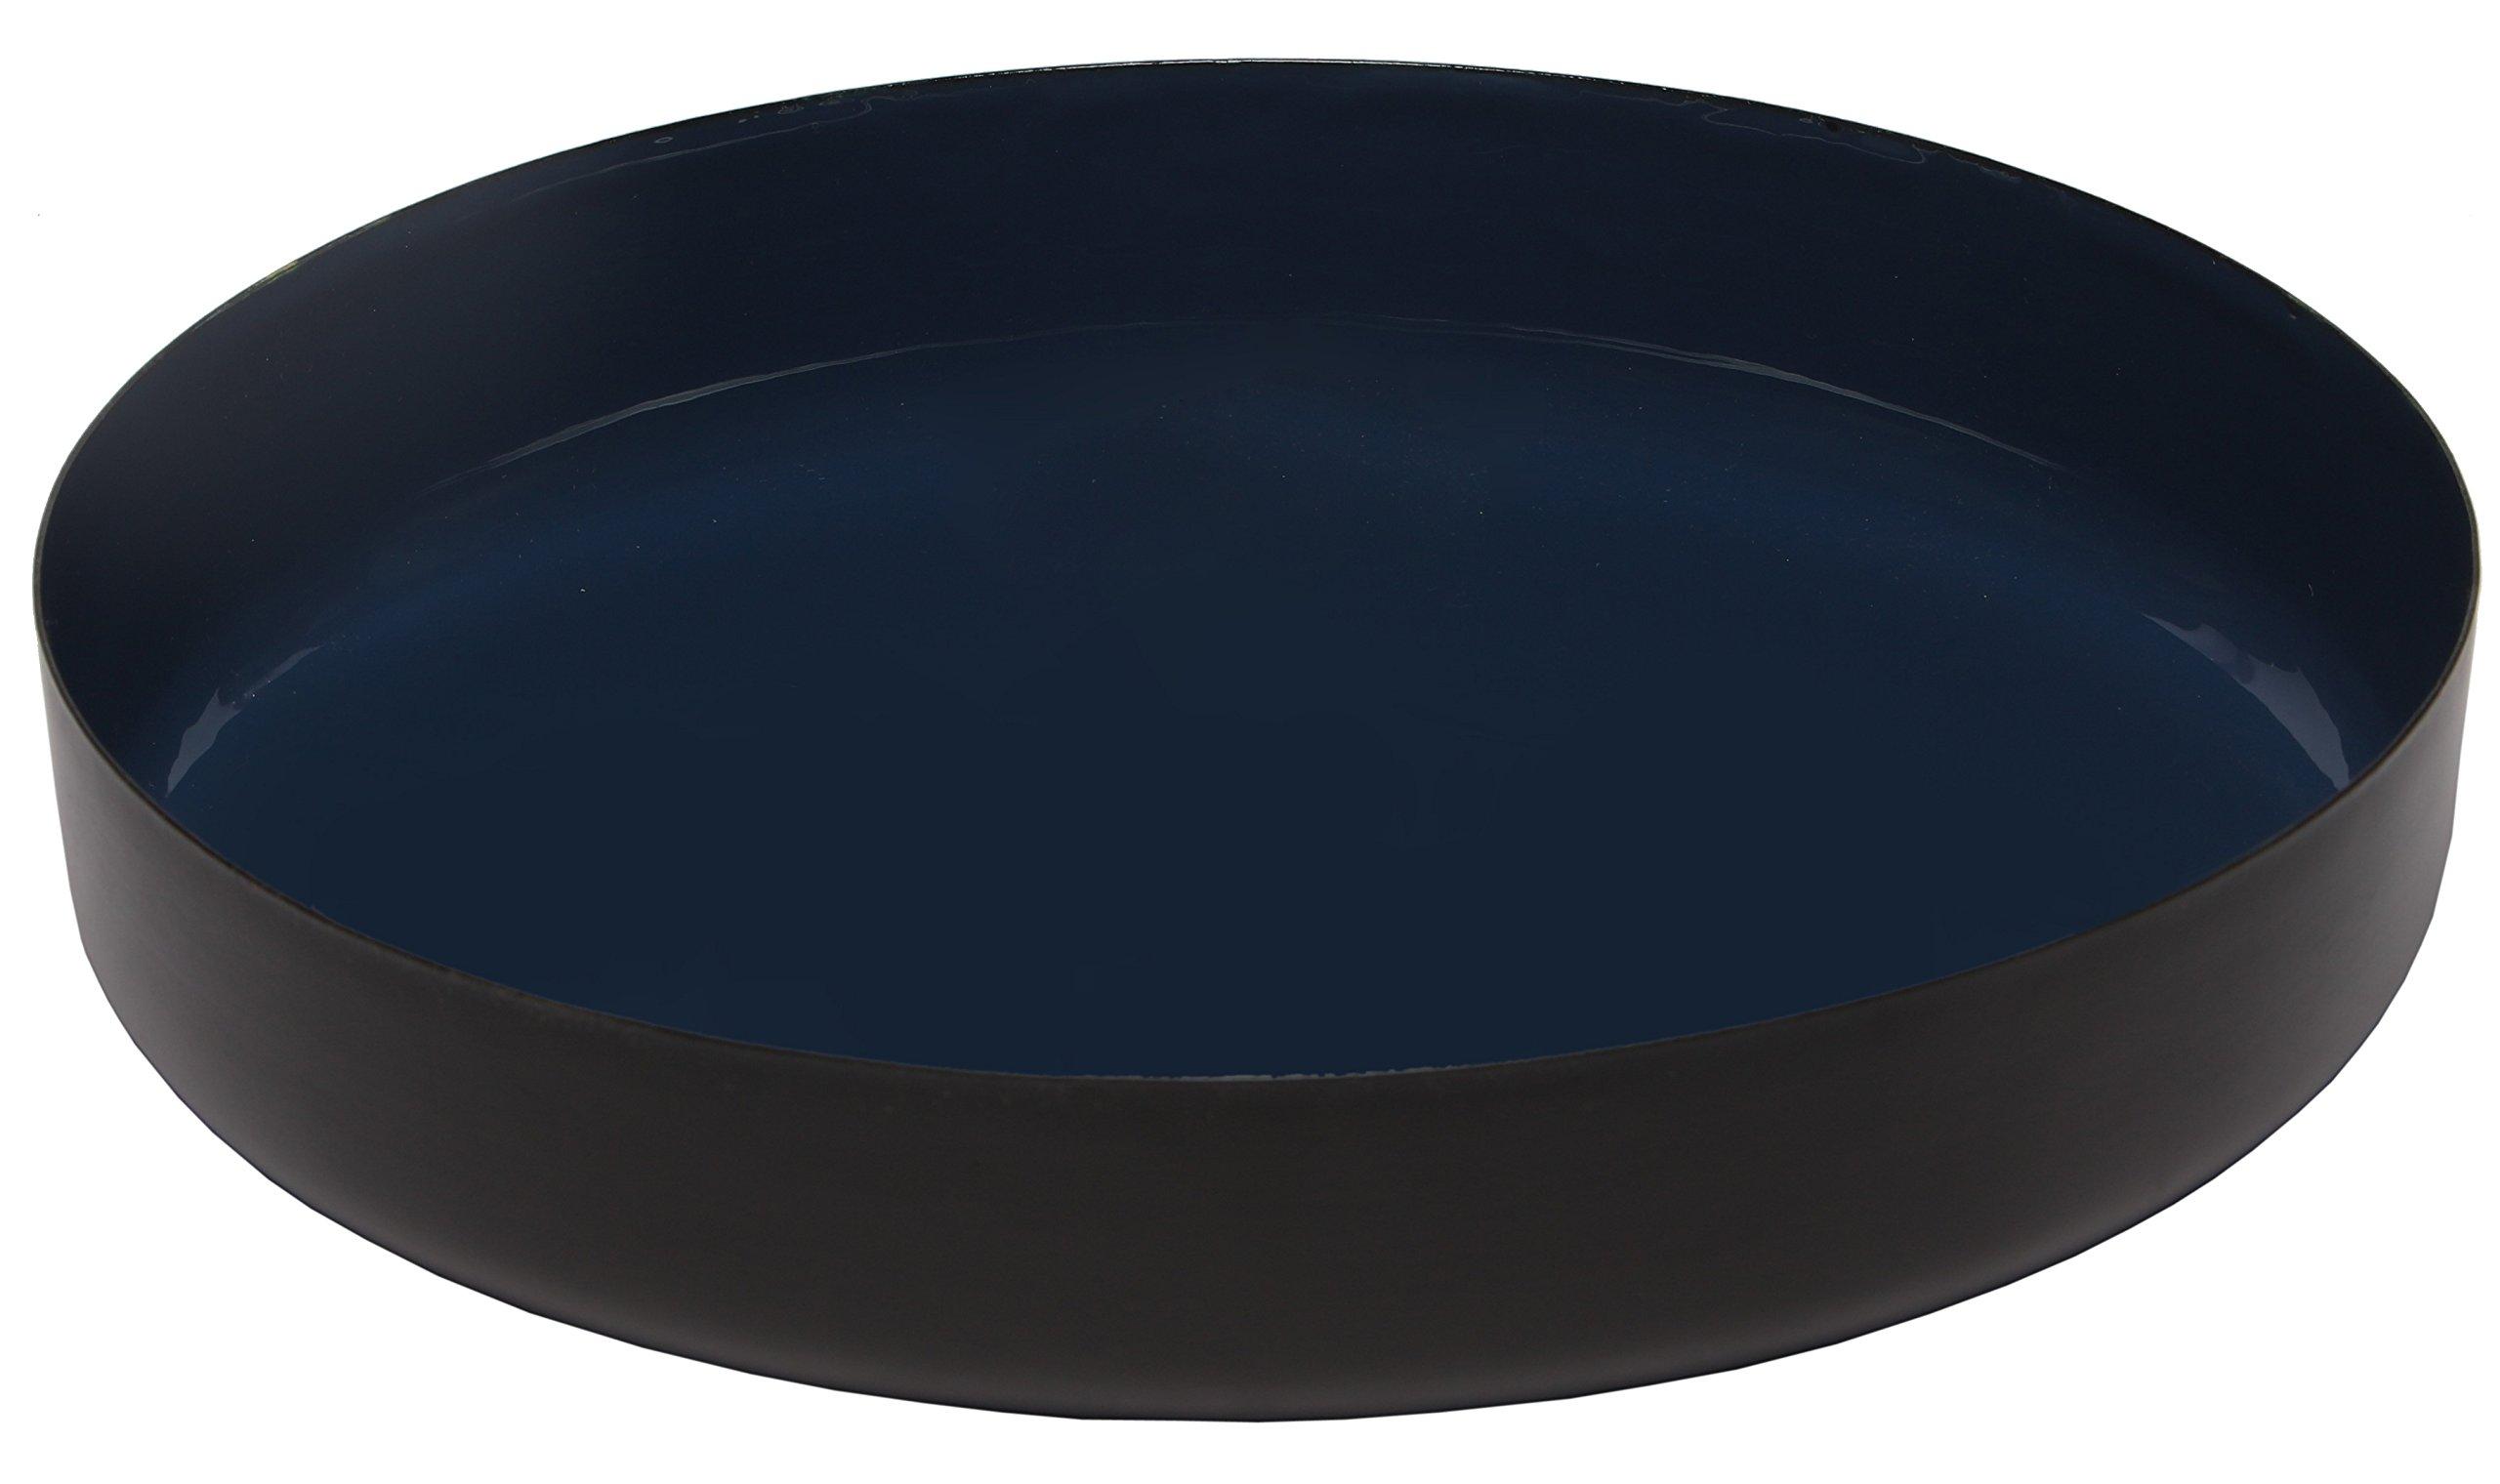 Melange Home Decor Modern Collection, 12-inch Round Platter, Color - Navy